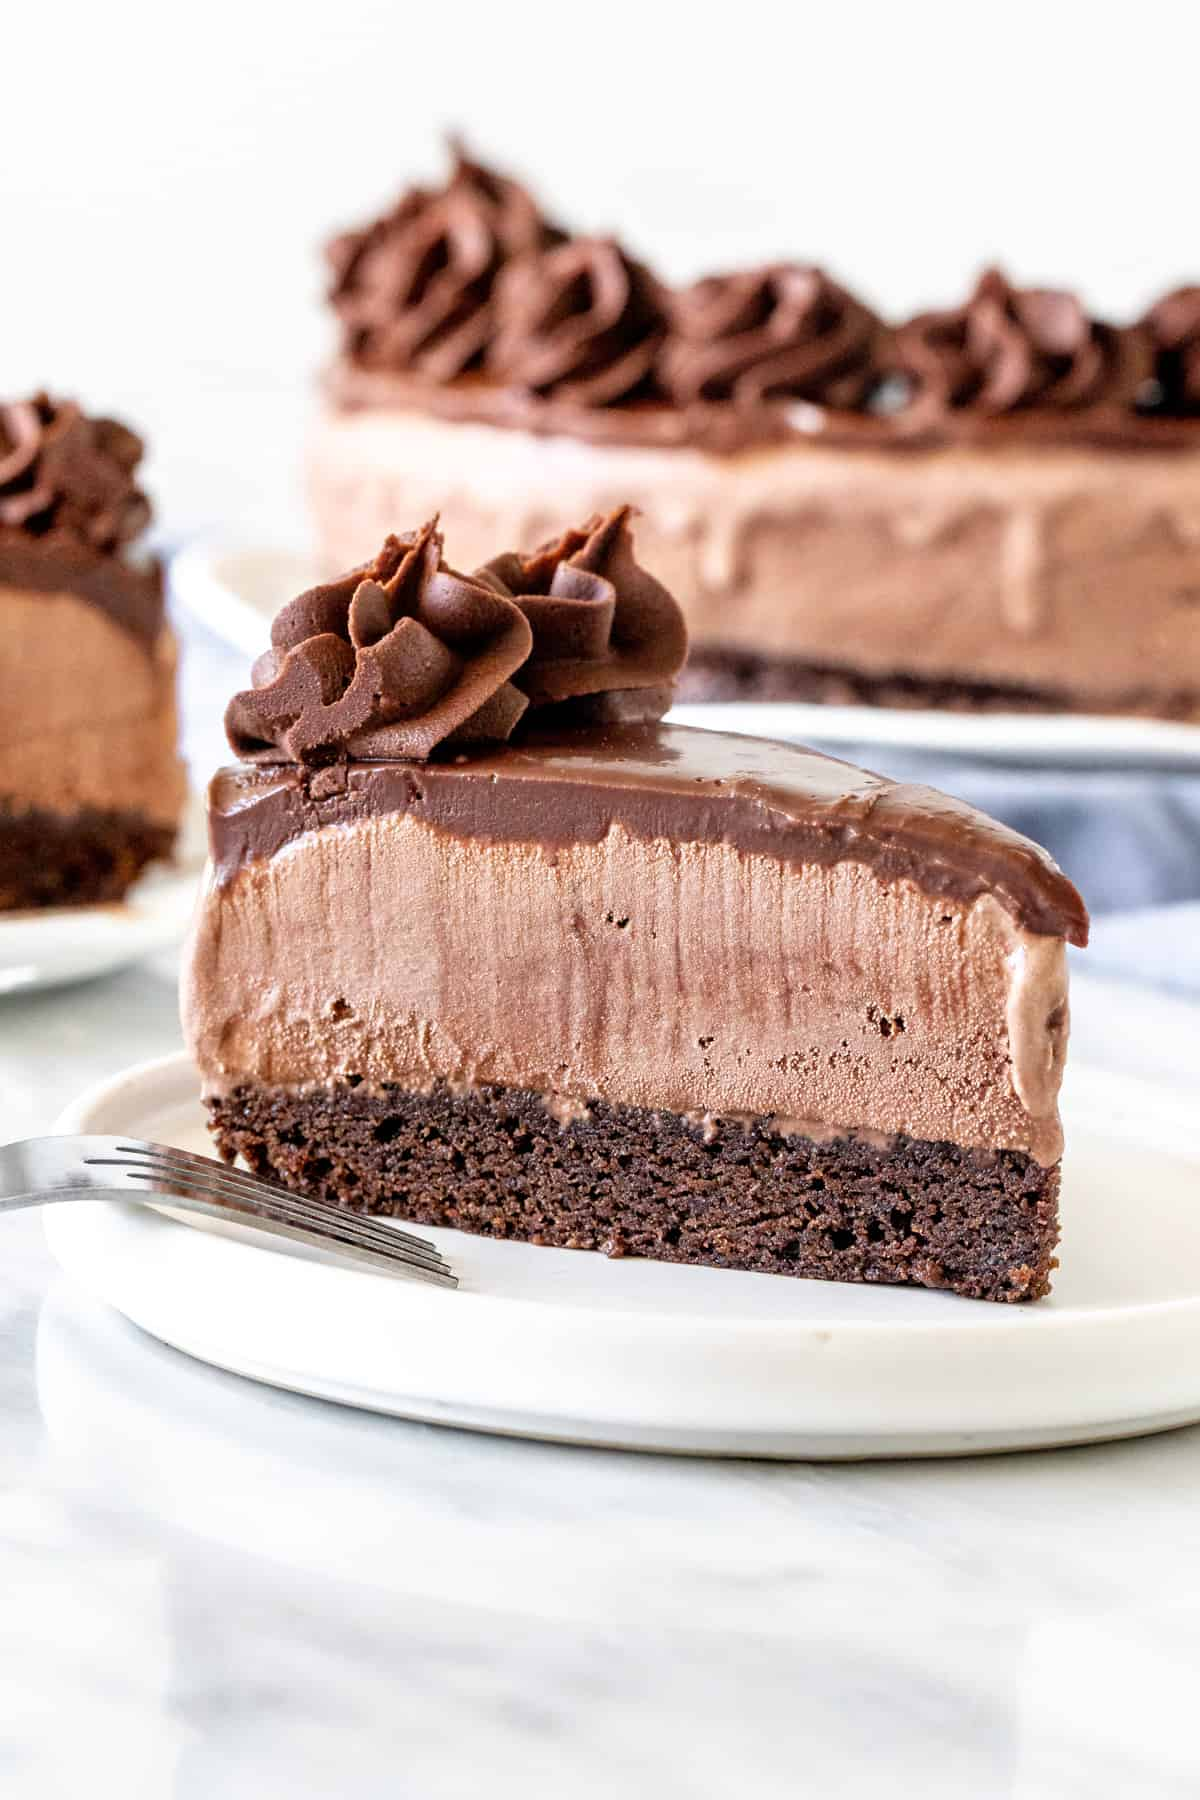 Slice of chocolate ice cream cake